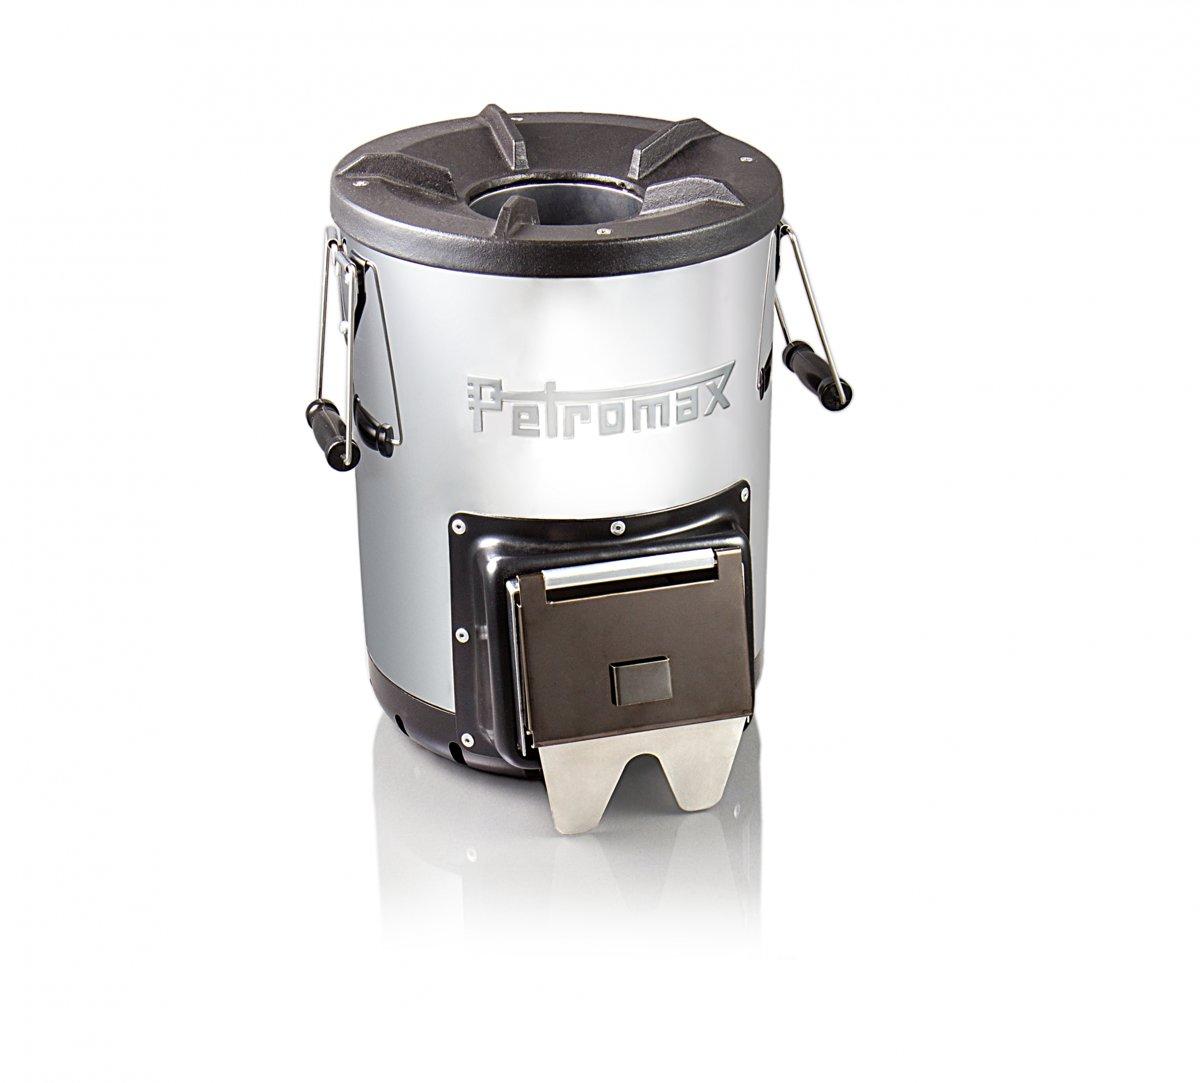 Petromax rocket stove oven fs 33 zilver kopen